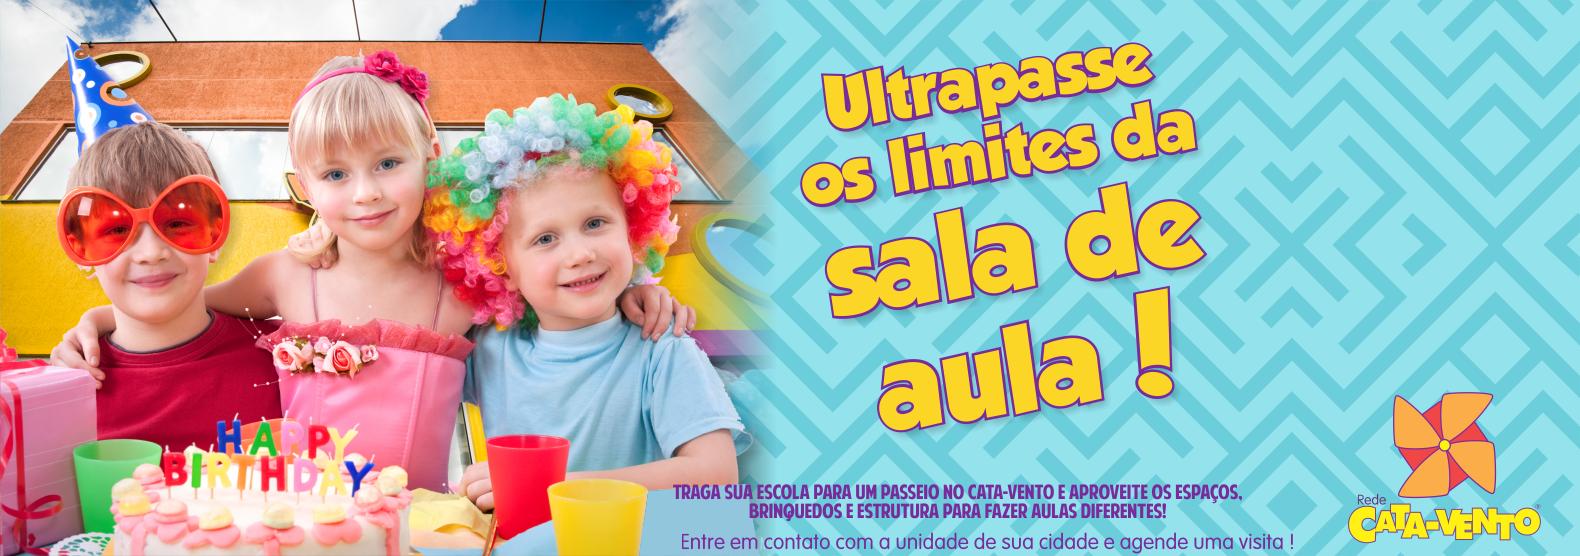 Superb Buffet Cata Vento A Maior Rede De Festas Do Brasil Interior Design Ideas Apansoteloinfo